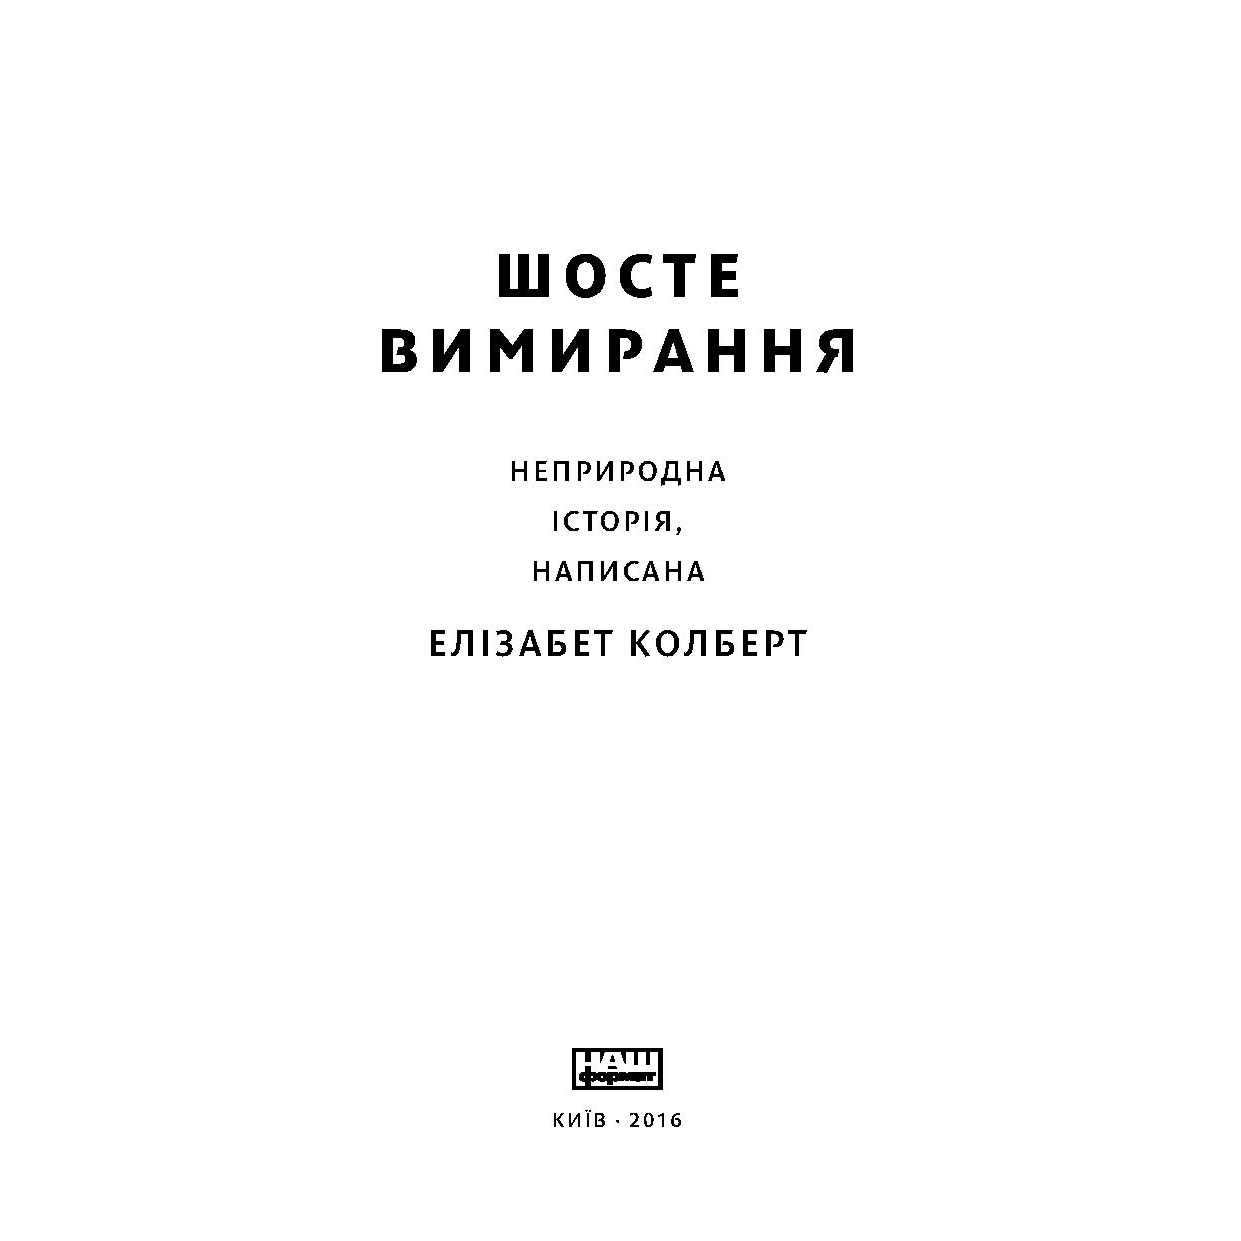 045_kolbert-elizabet_shoste-vymyrannja_prev